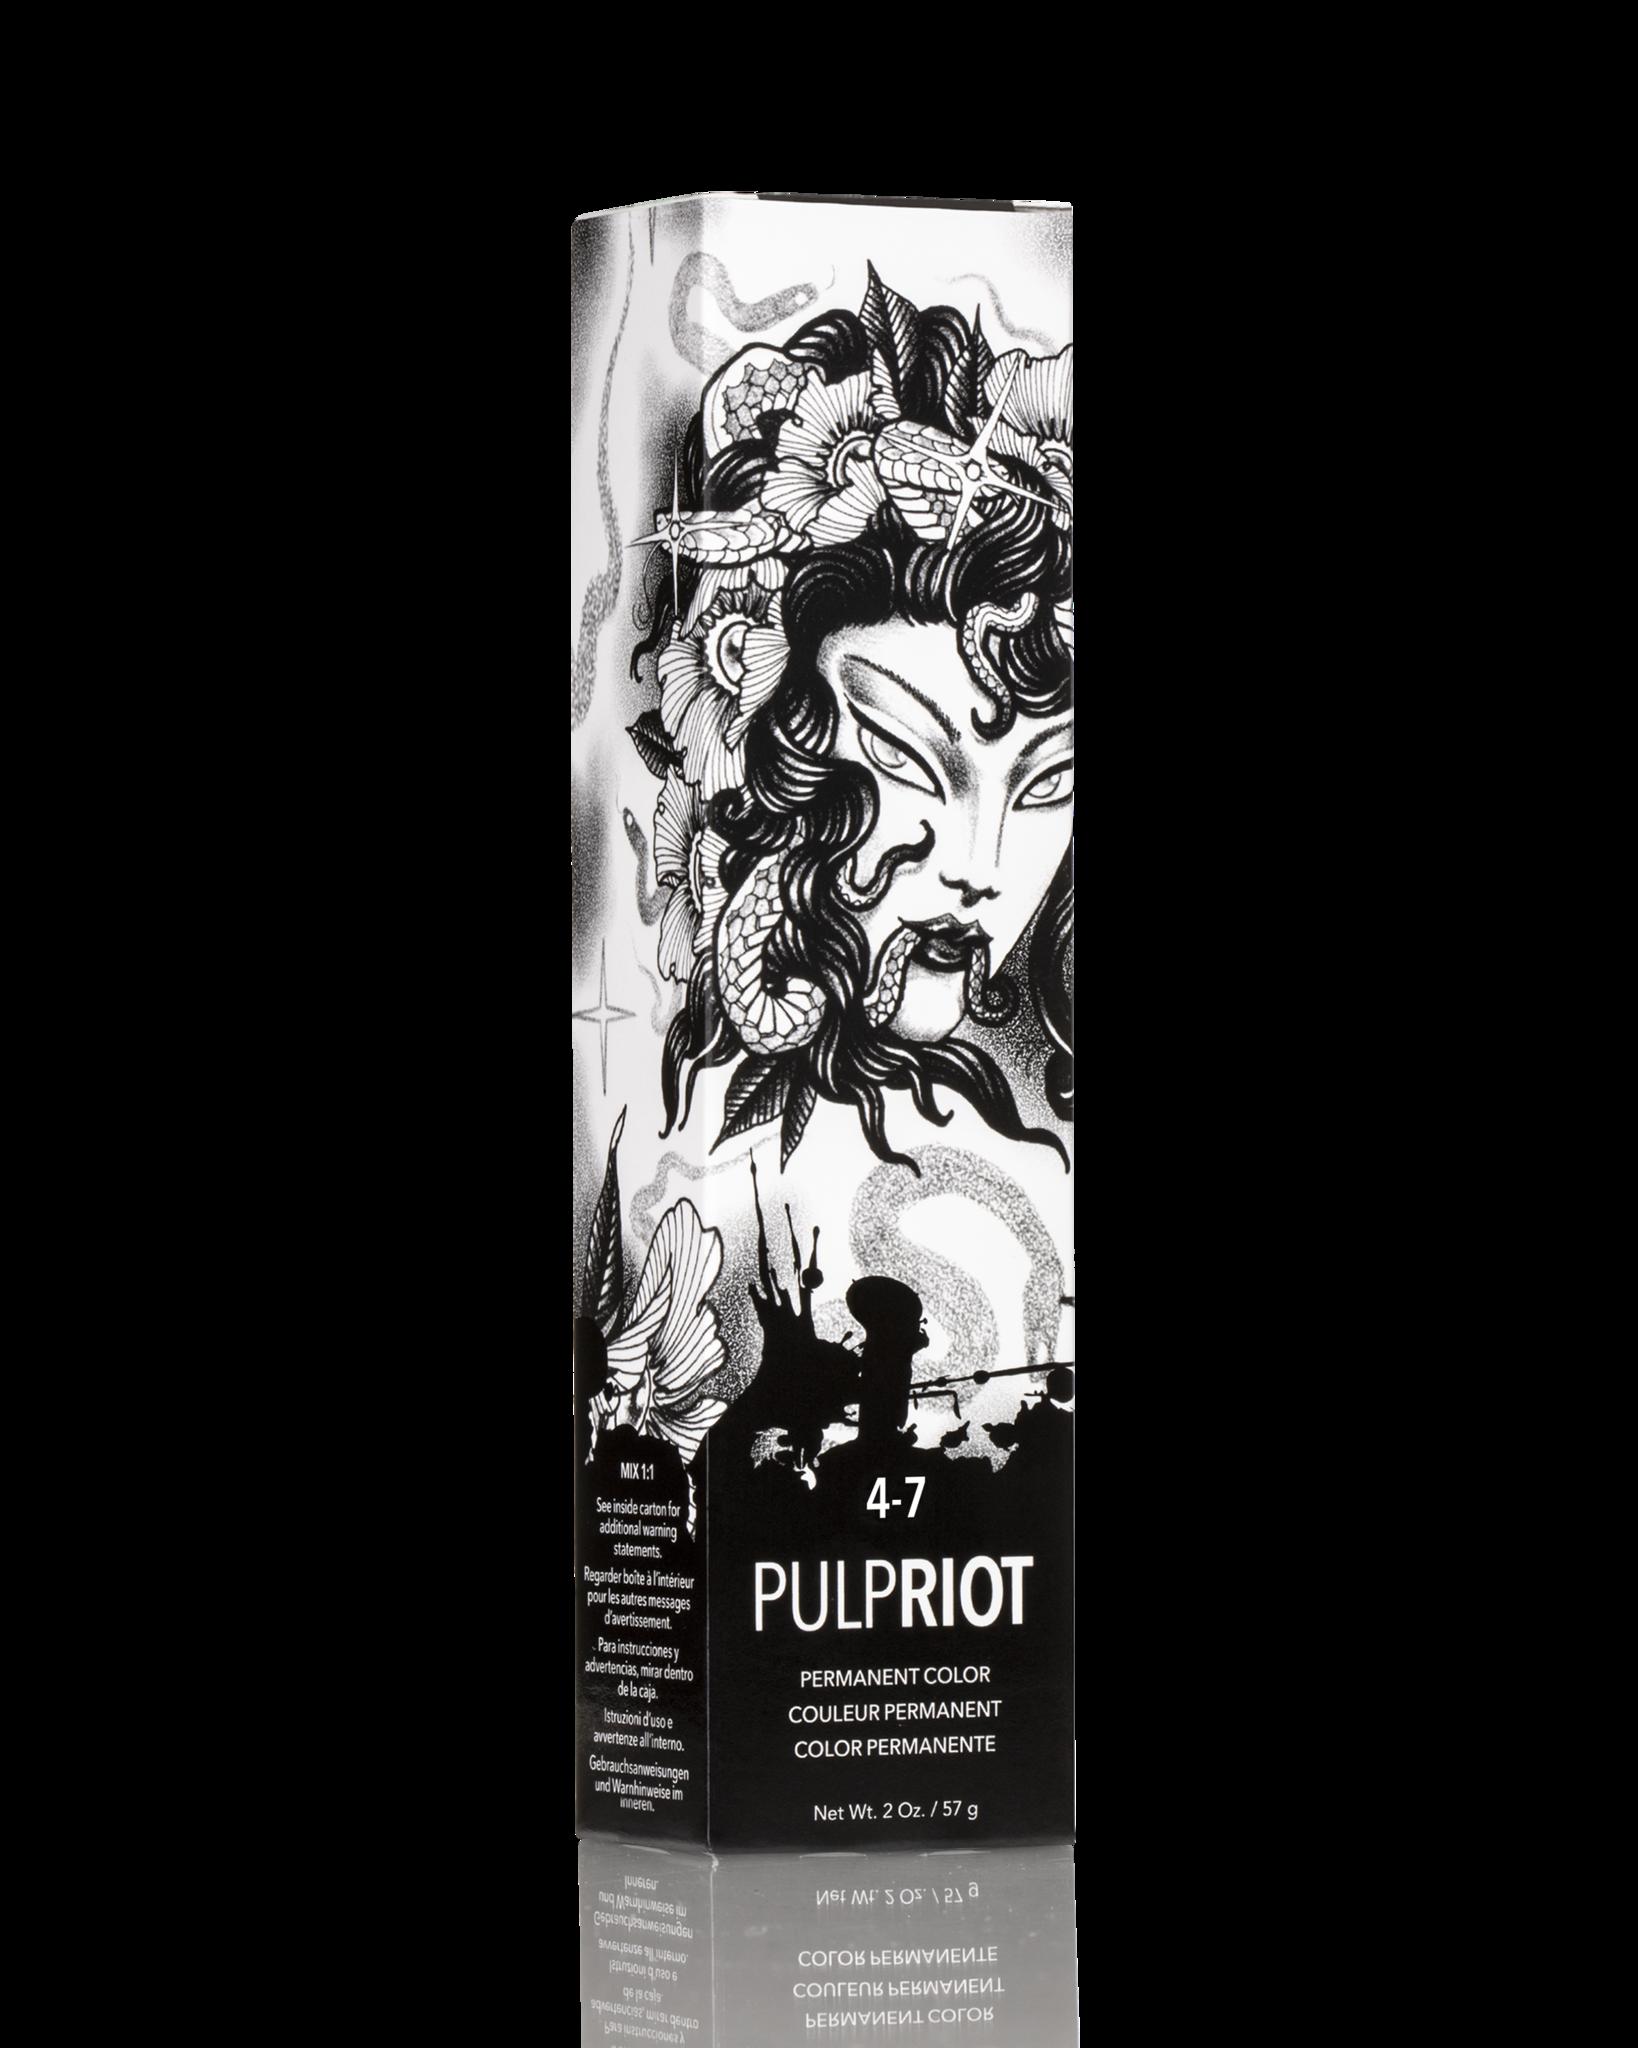 Pulp Riot PULP RIOT FACTION 8 MATE 4-7